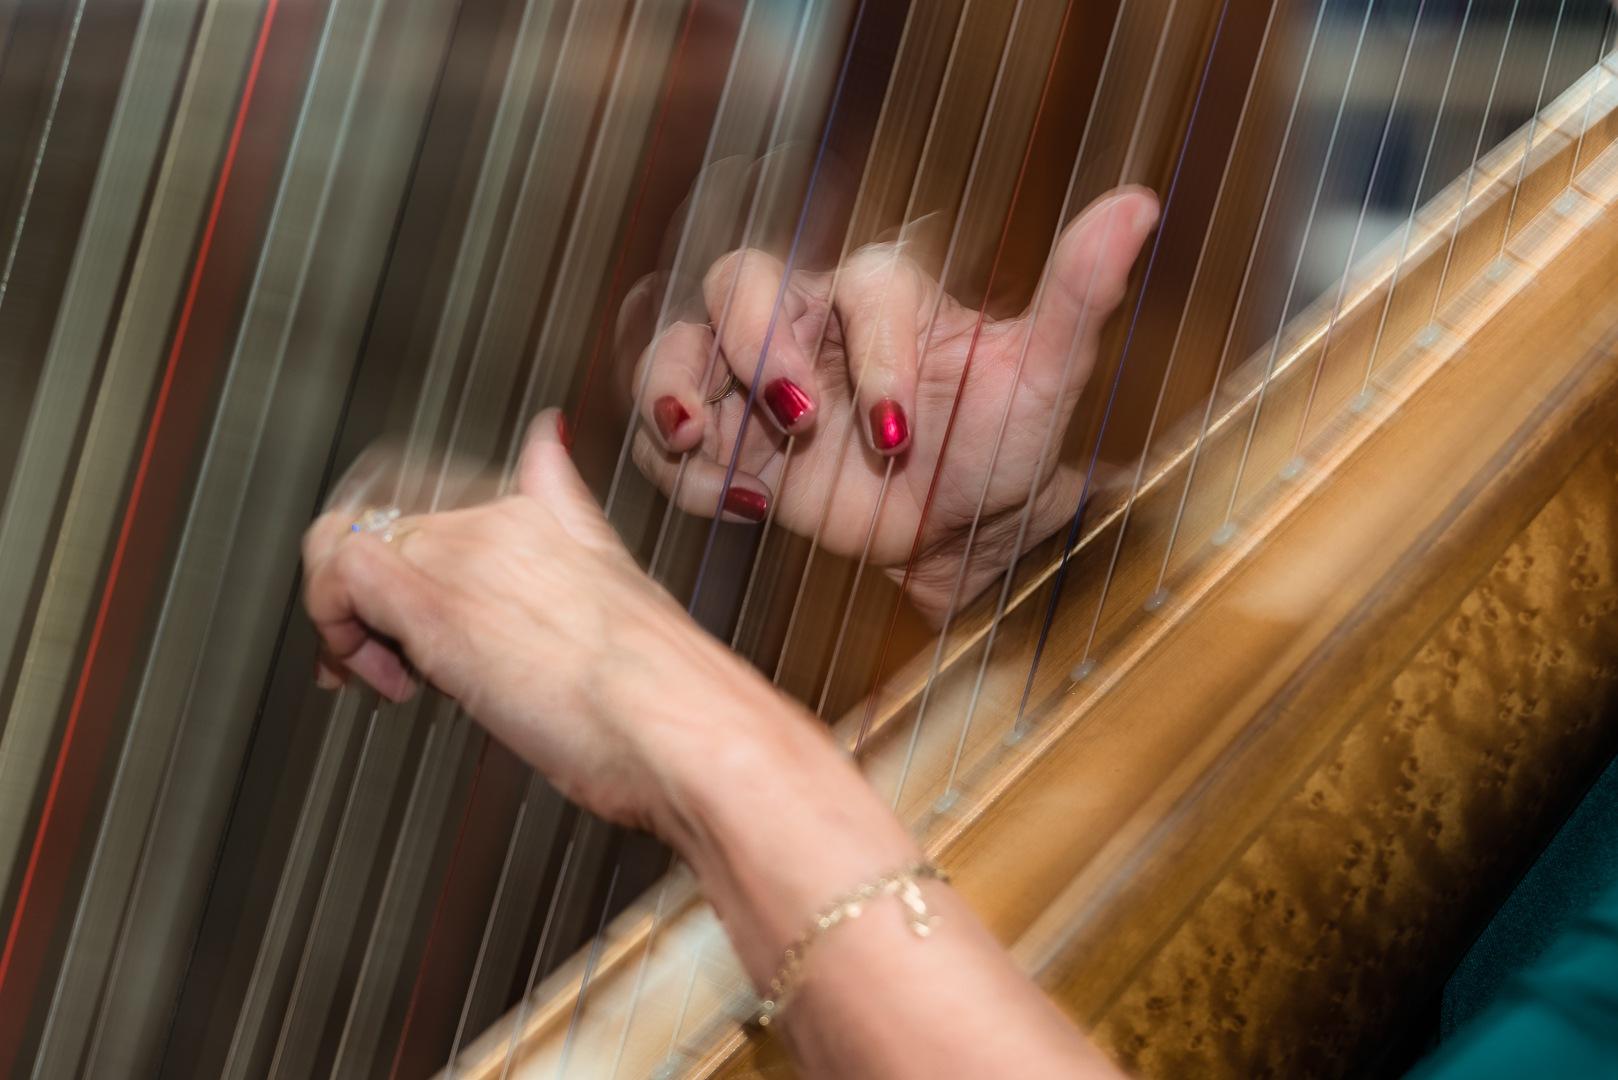 Dreams on my fingers by Joggie van Staden